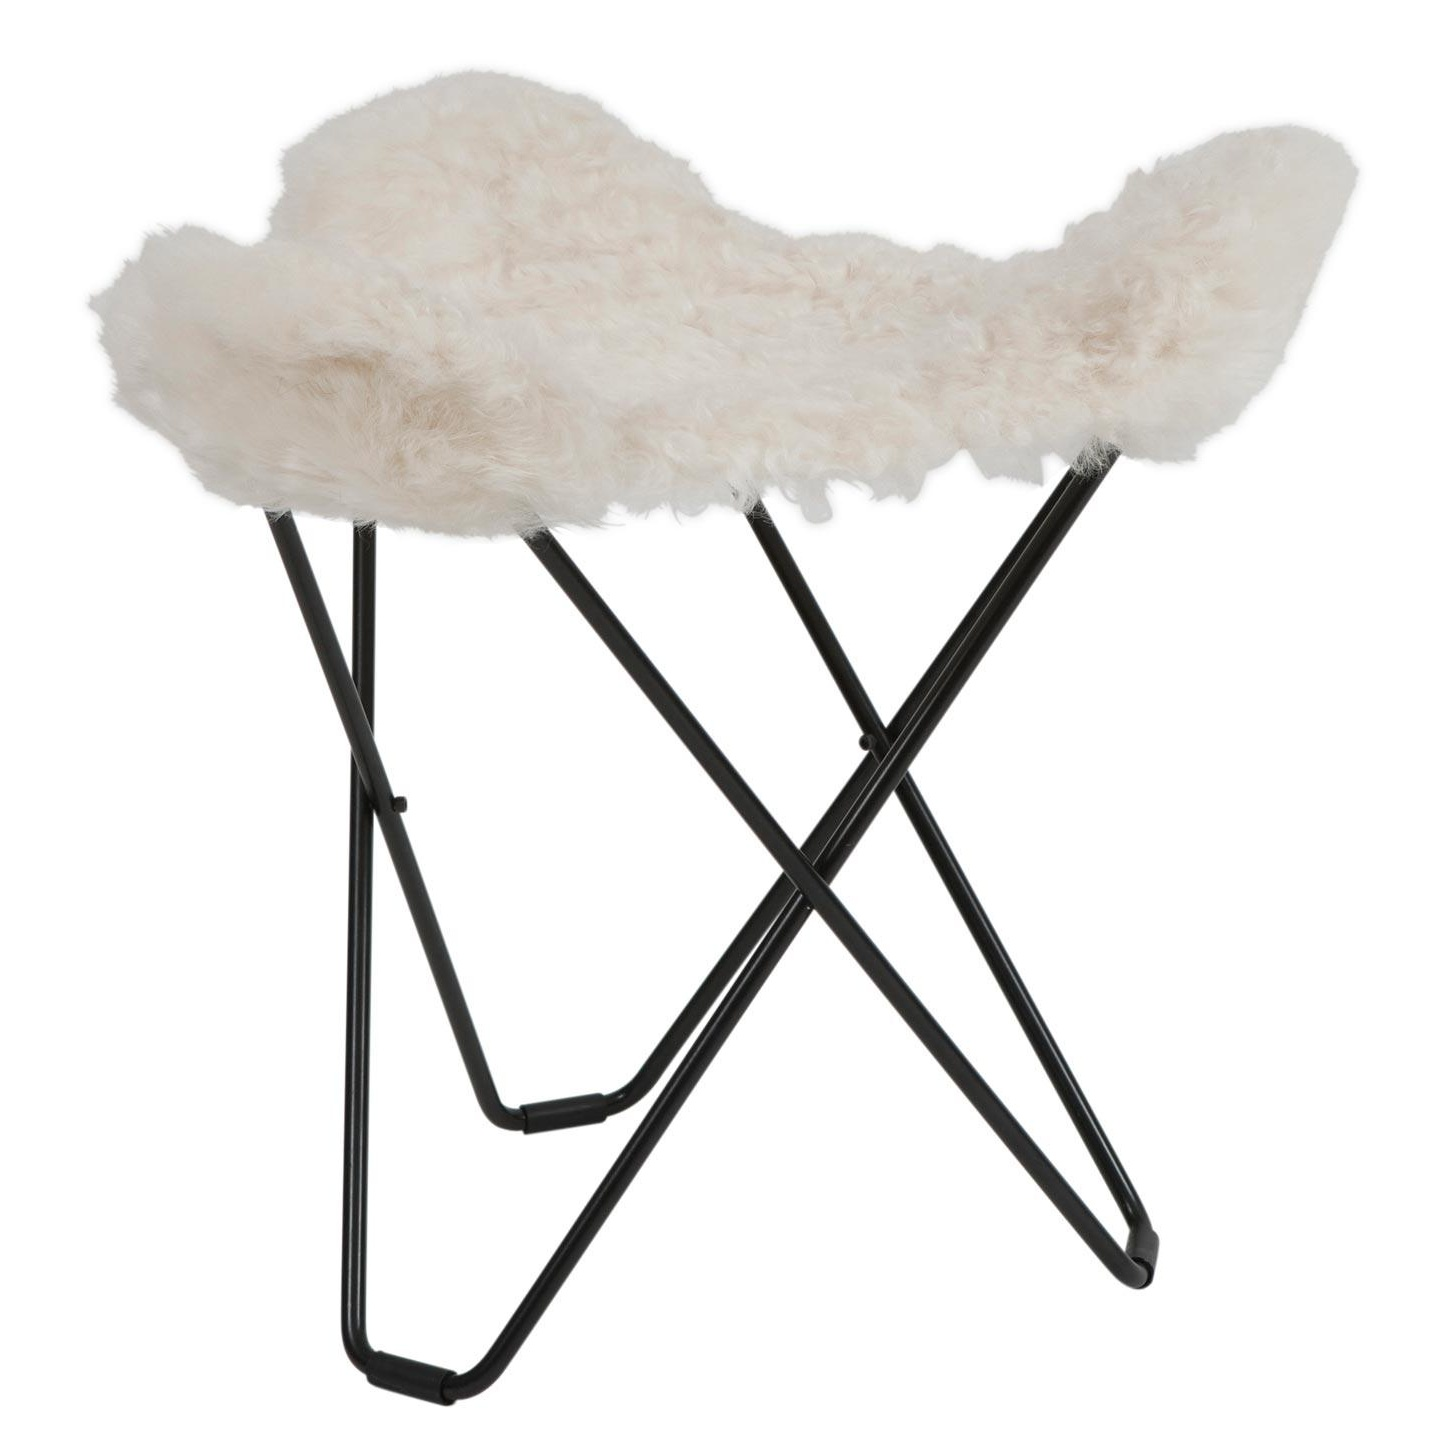 cuero - Flying Goose Iceland - Tabouret - blanc/agneau islandais Shorn White/châssis noir